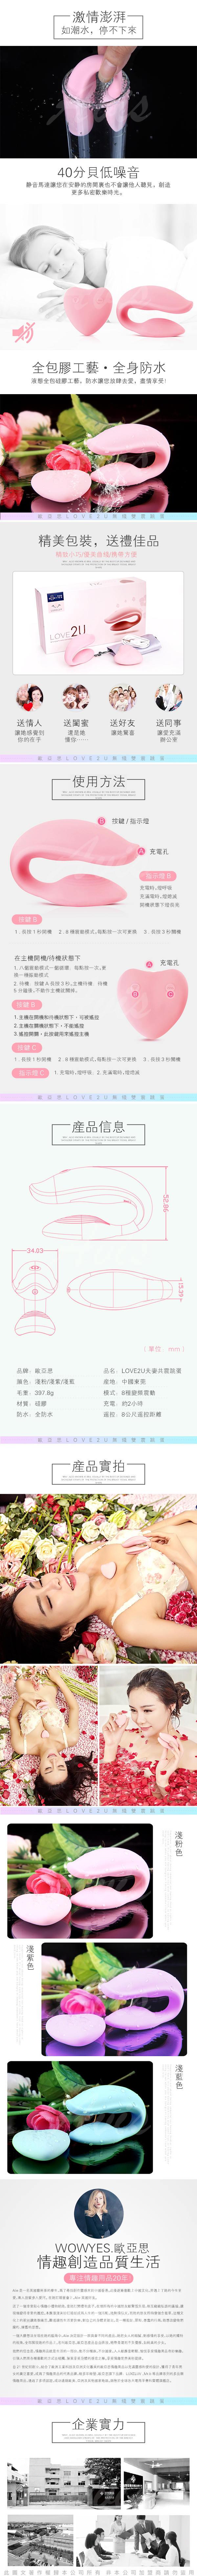 WOWYES LOVE 2U 8段變頻 無線遙控情侶共振器 粉